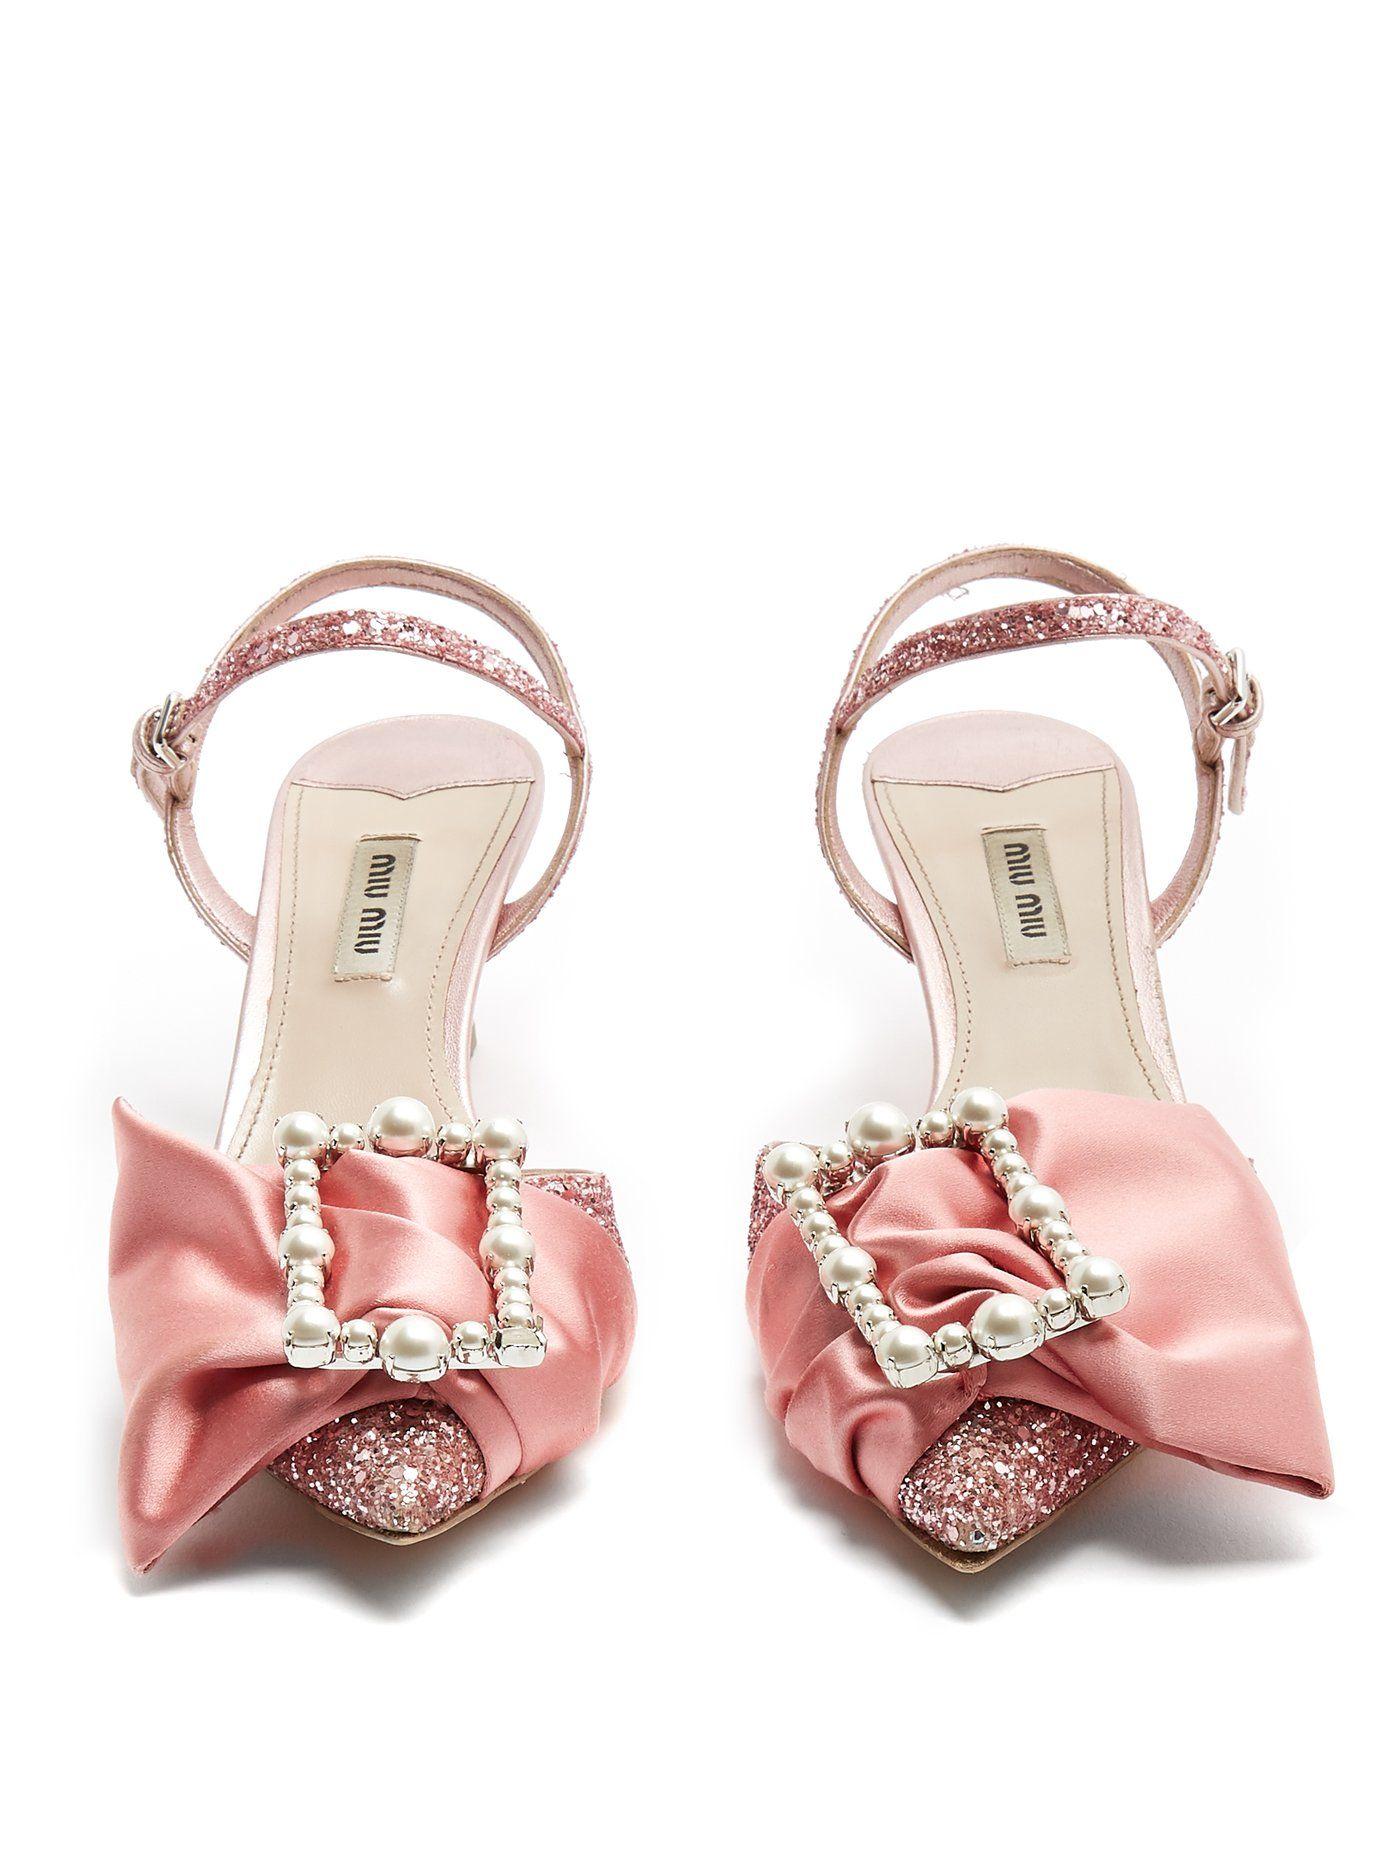 51e930c7b81 Click here to buy Miu Miu Bow-embellished glitter pumps at  MATCHESFASHION.COM